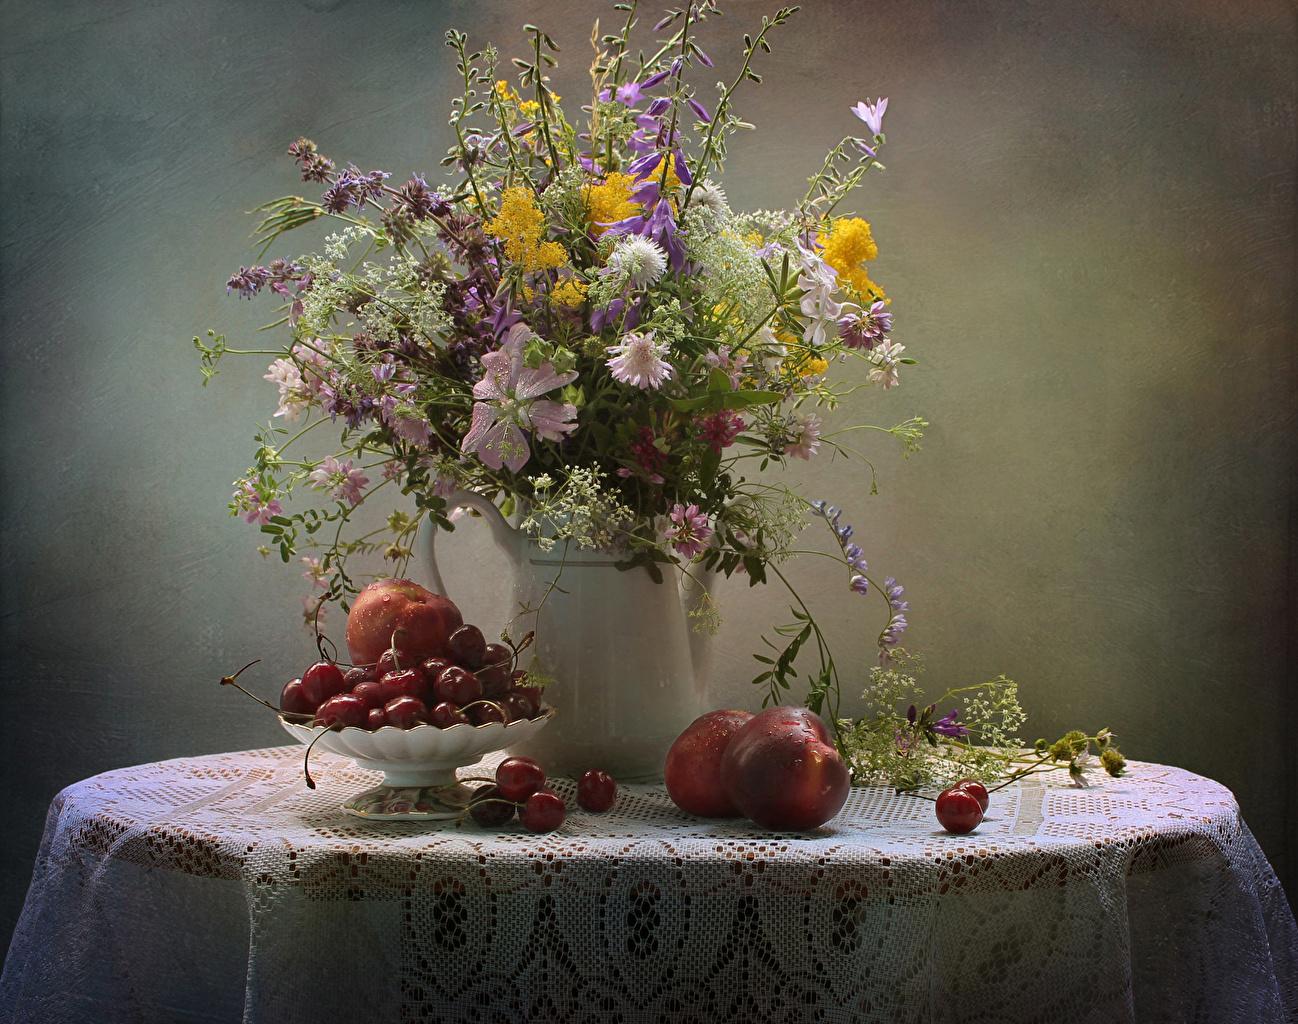 Desktop Wallpapers Tablecloth Bouquets flower Cherry Peaches Vase Food Table Bells Cornflowers Still-life bouquet Flowers Handbell Centaurea